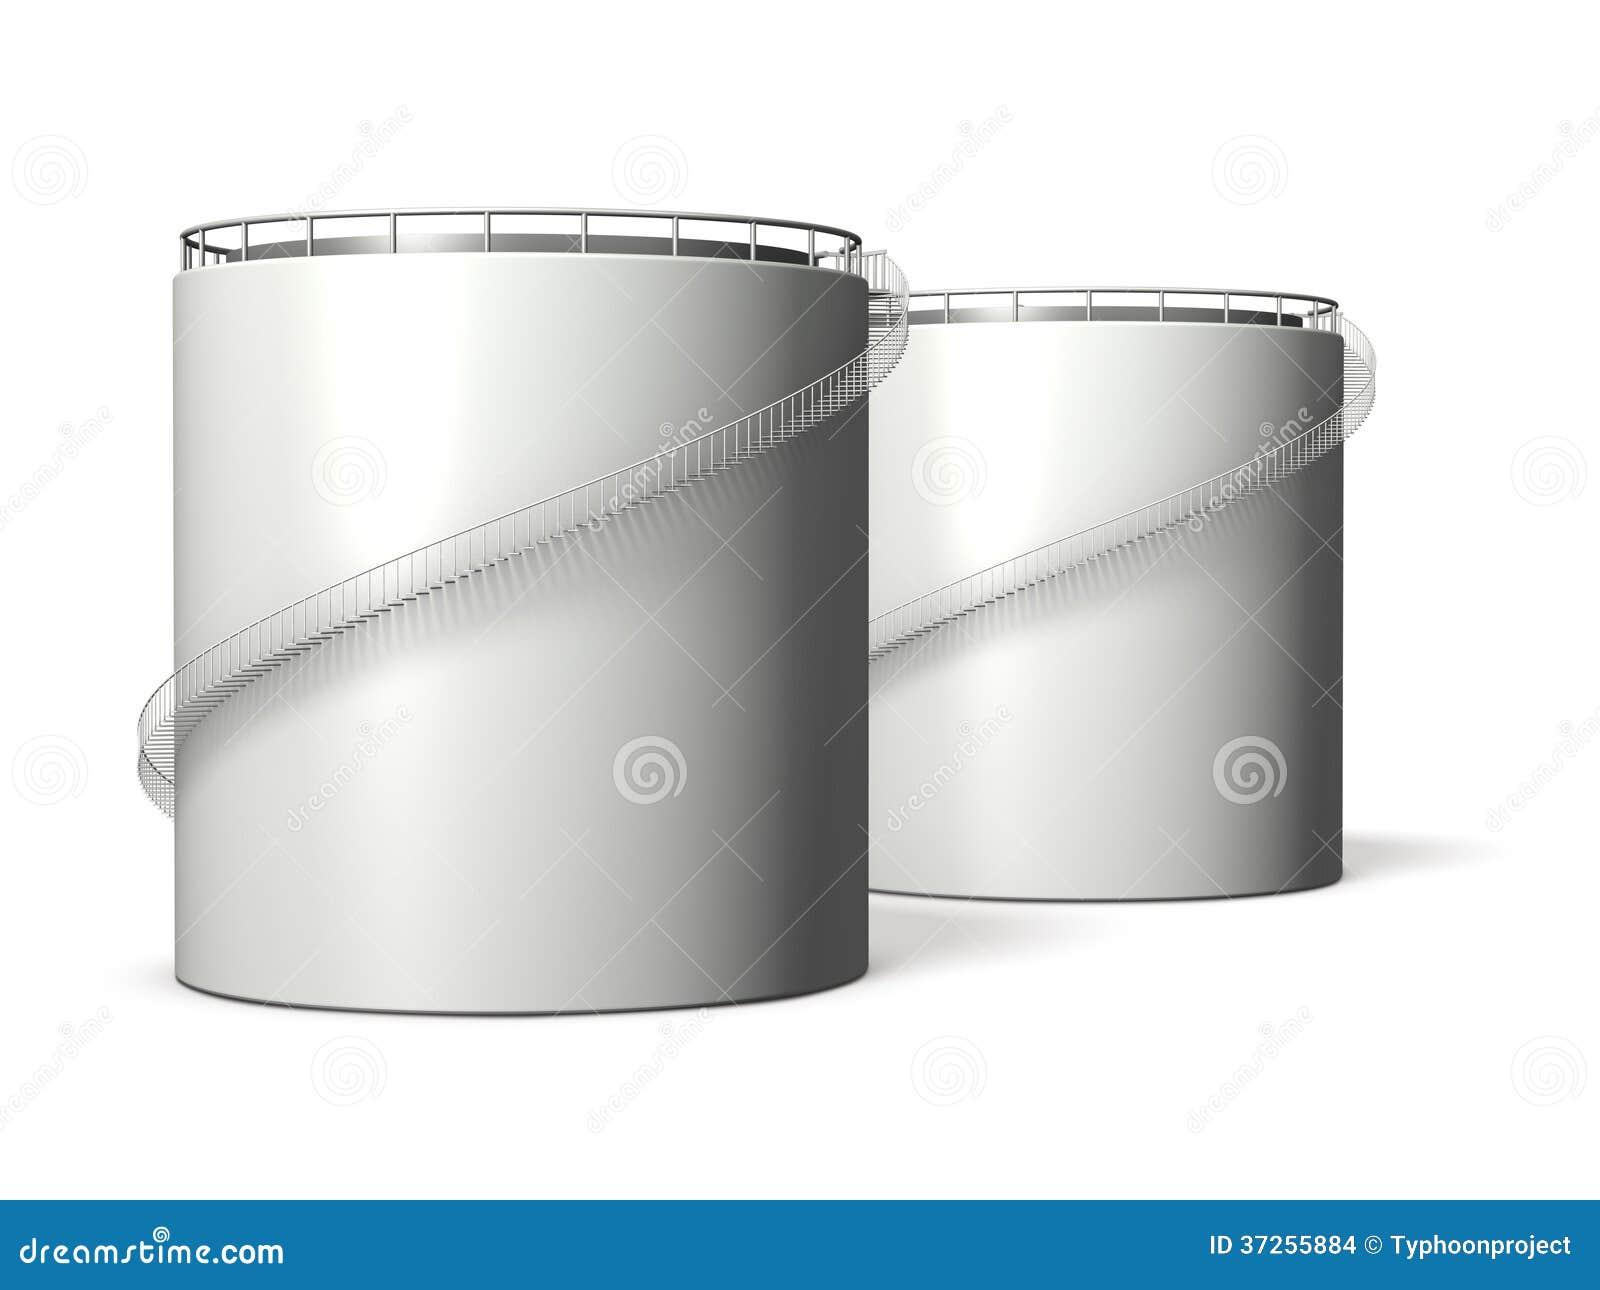 oil tank farm business plan